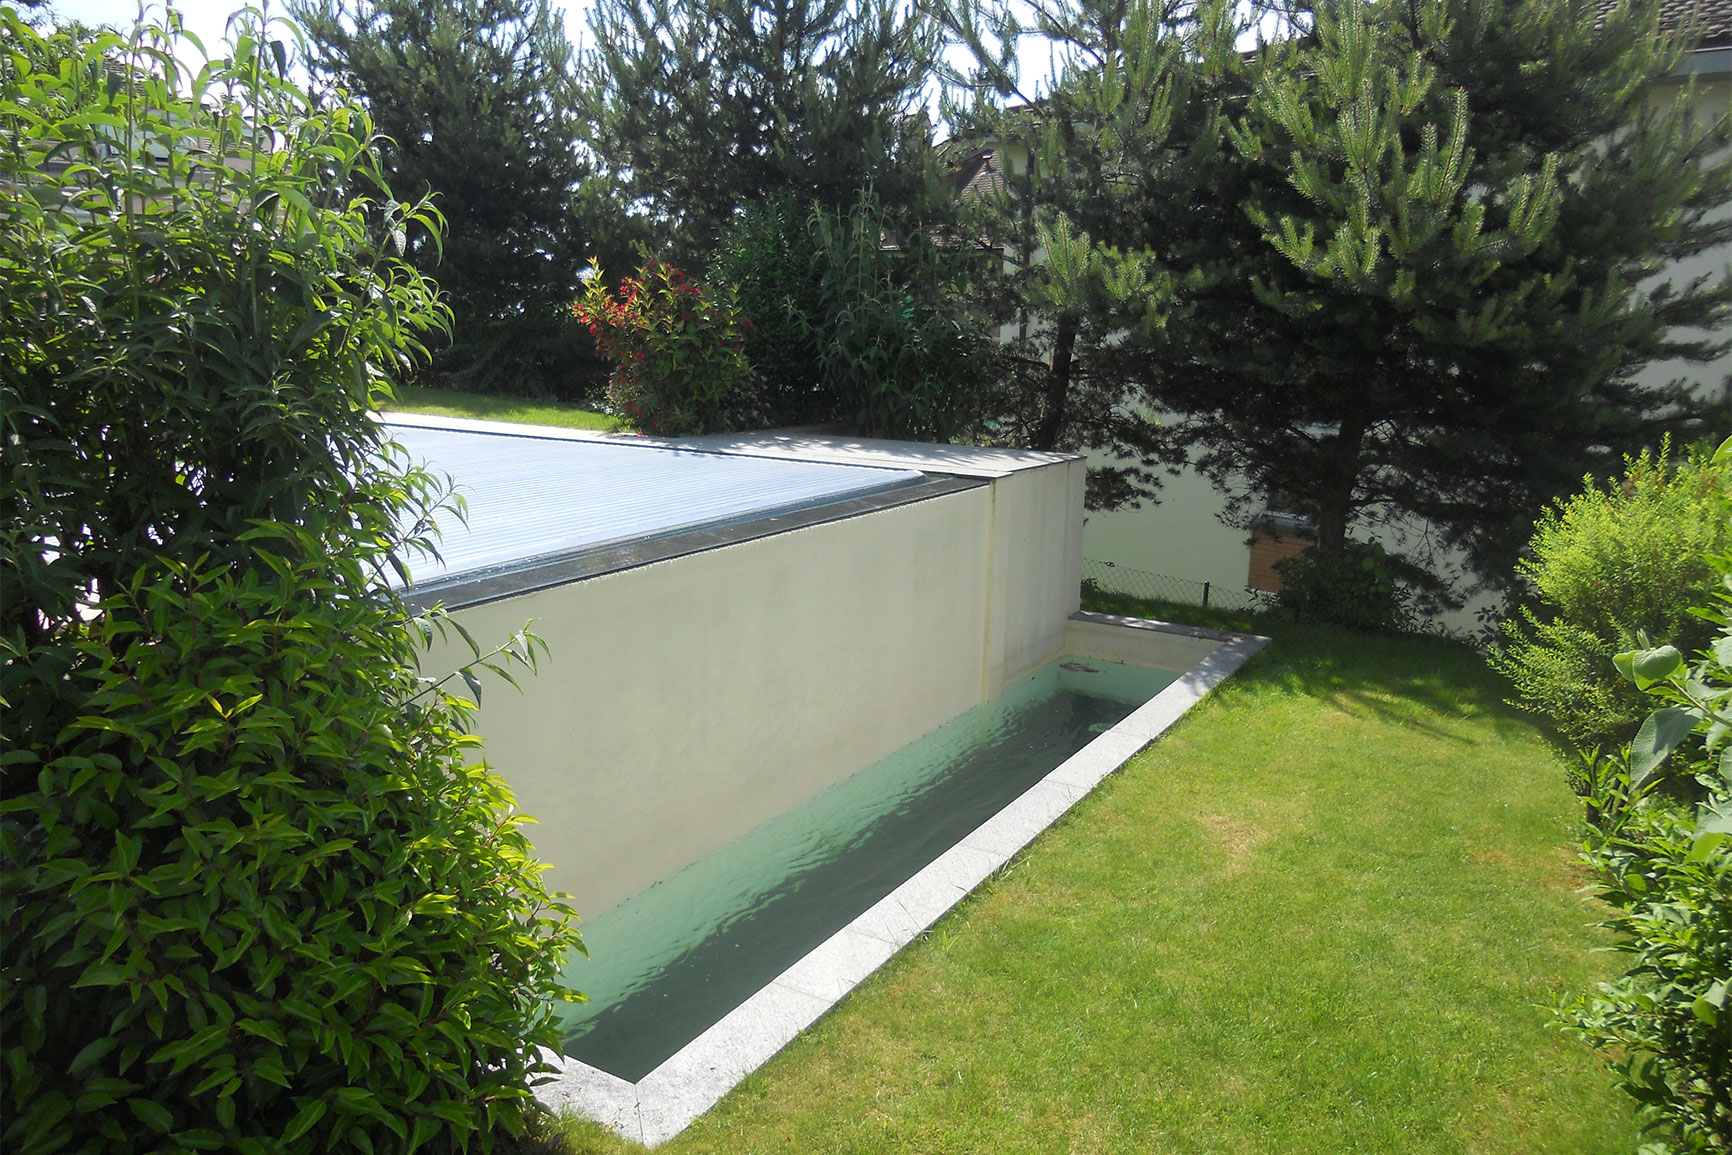 D bordement carrelage piscines widmer for Chavannes piscine